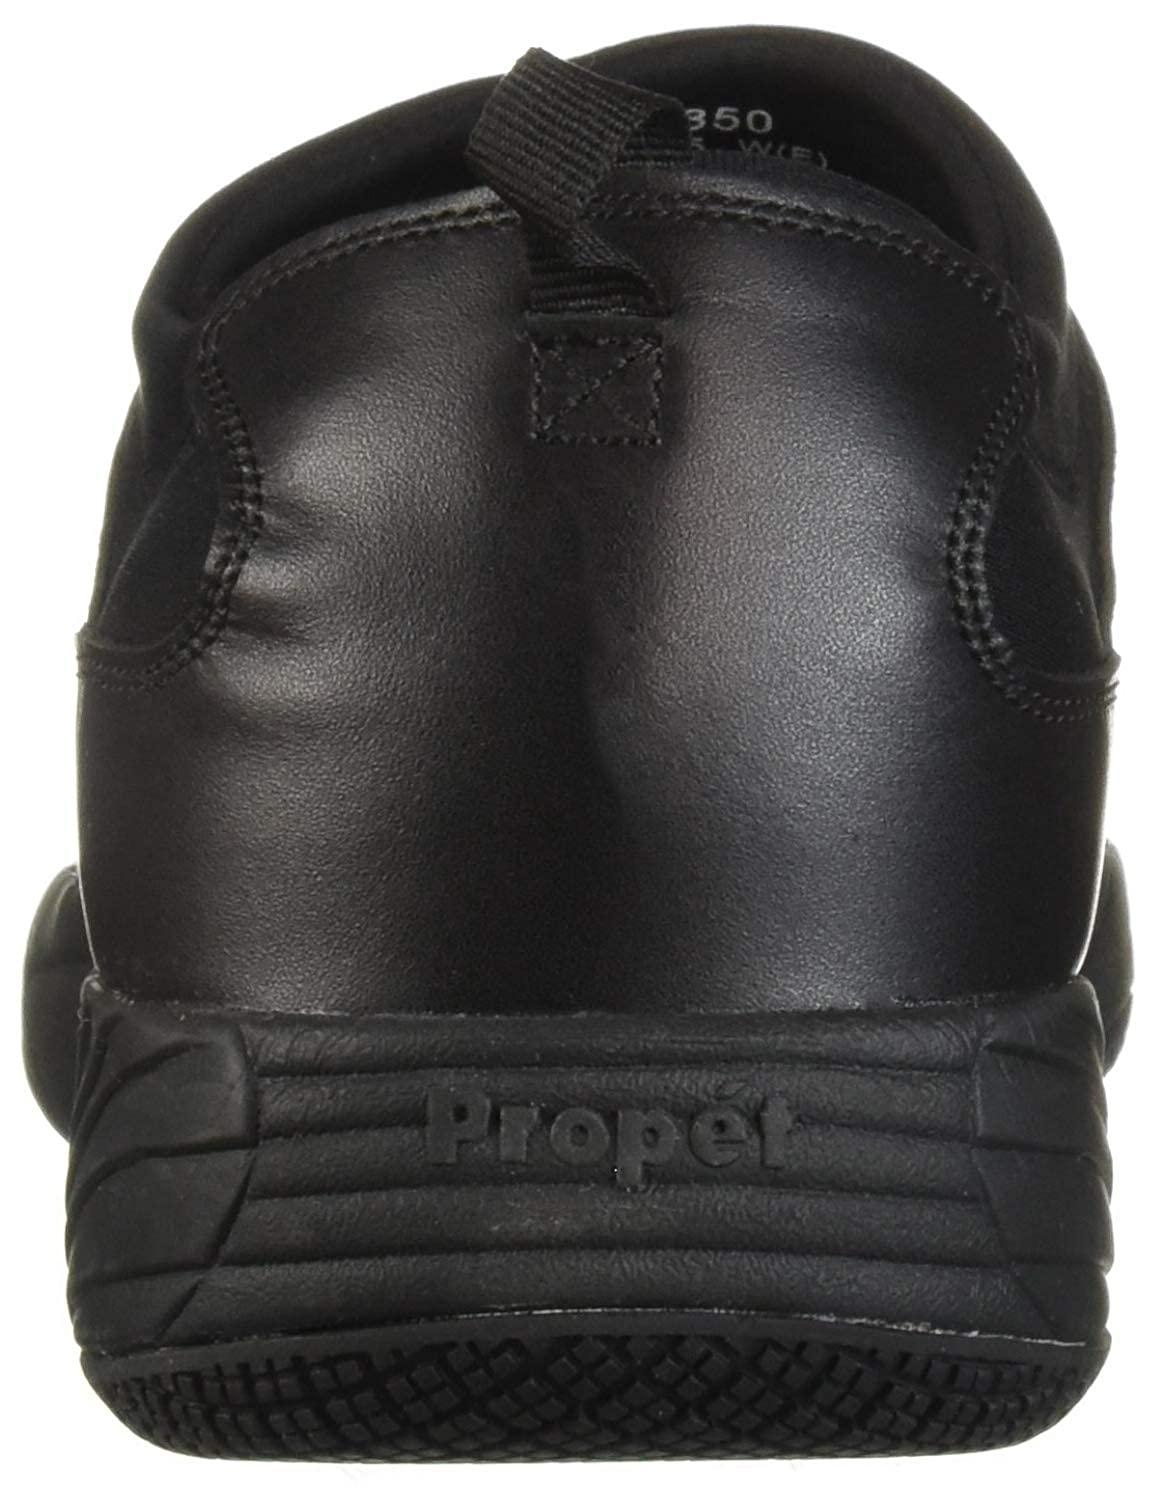 76baca246664be Amazon.com   Propet Men's M3850 Washable Moc Walking Shoe   Loafers &  Slip-Ons